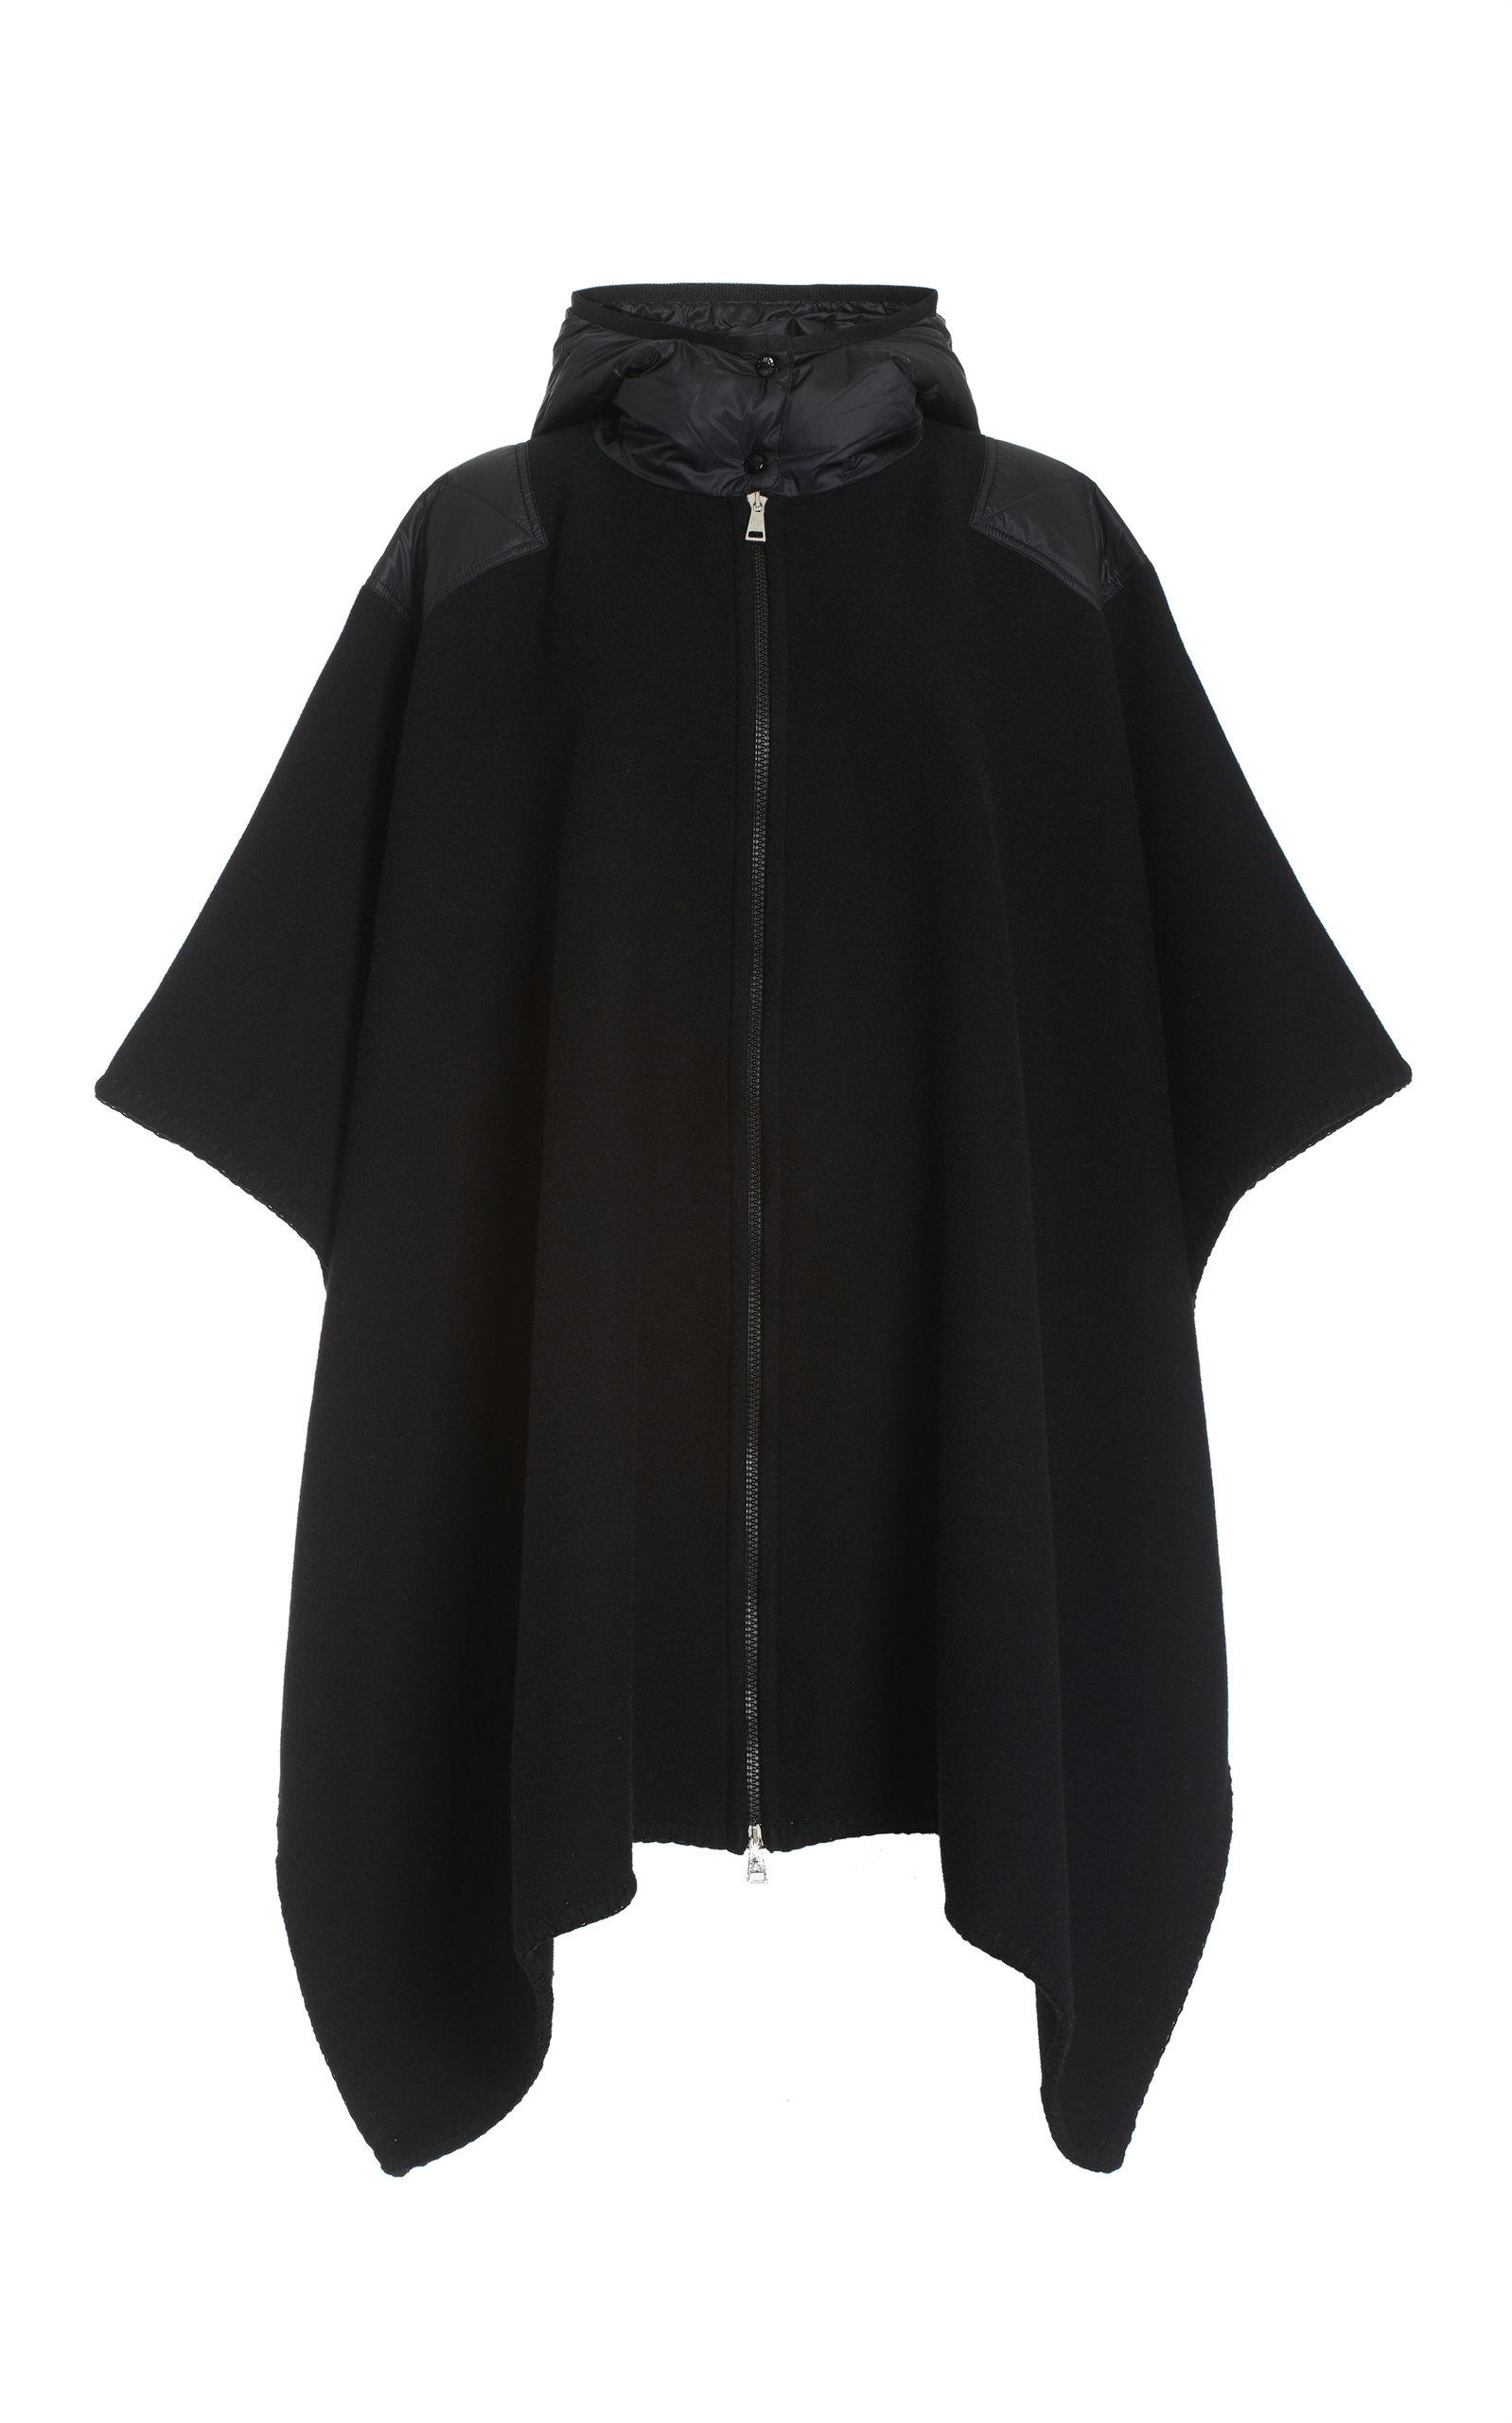 Moncler - Women's Mantella Shell-Trimmed Wool Hooded Cape Jacket - Black - Moda Operandi